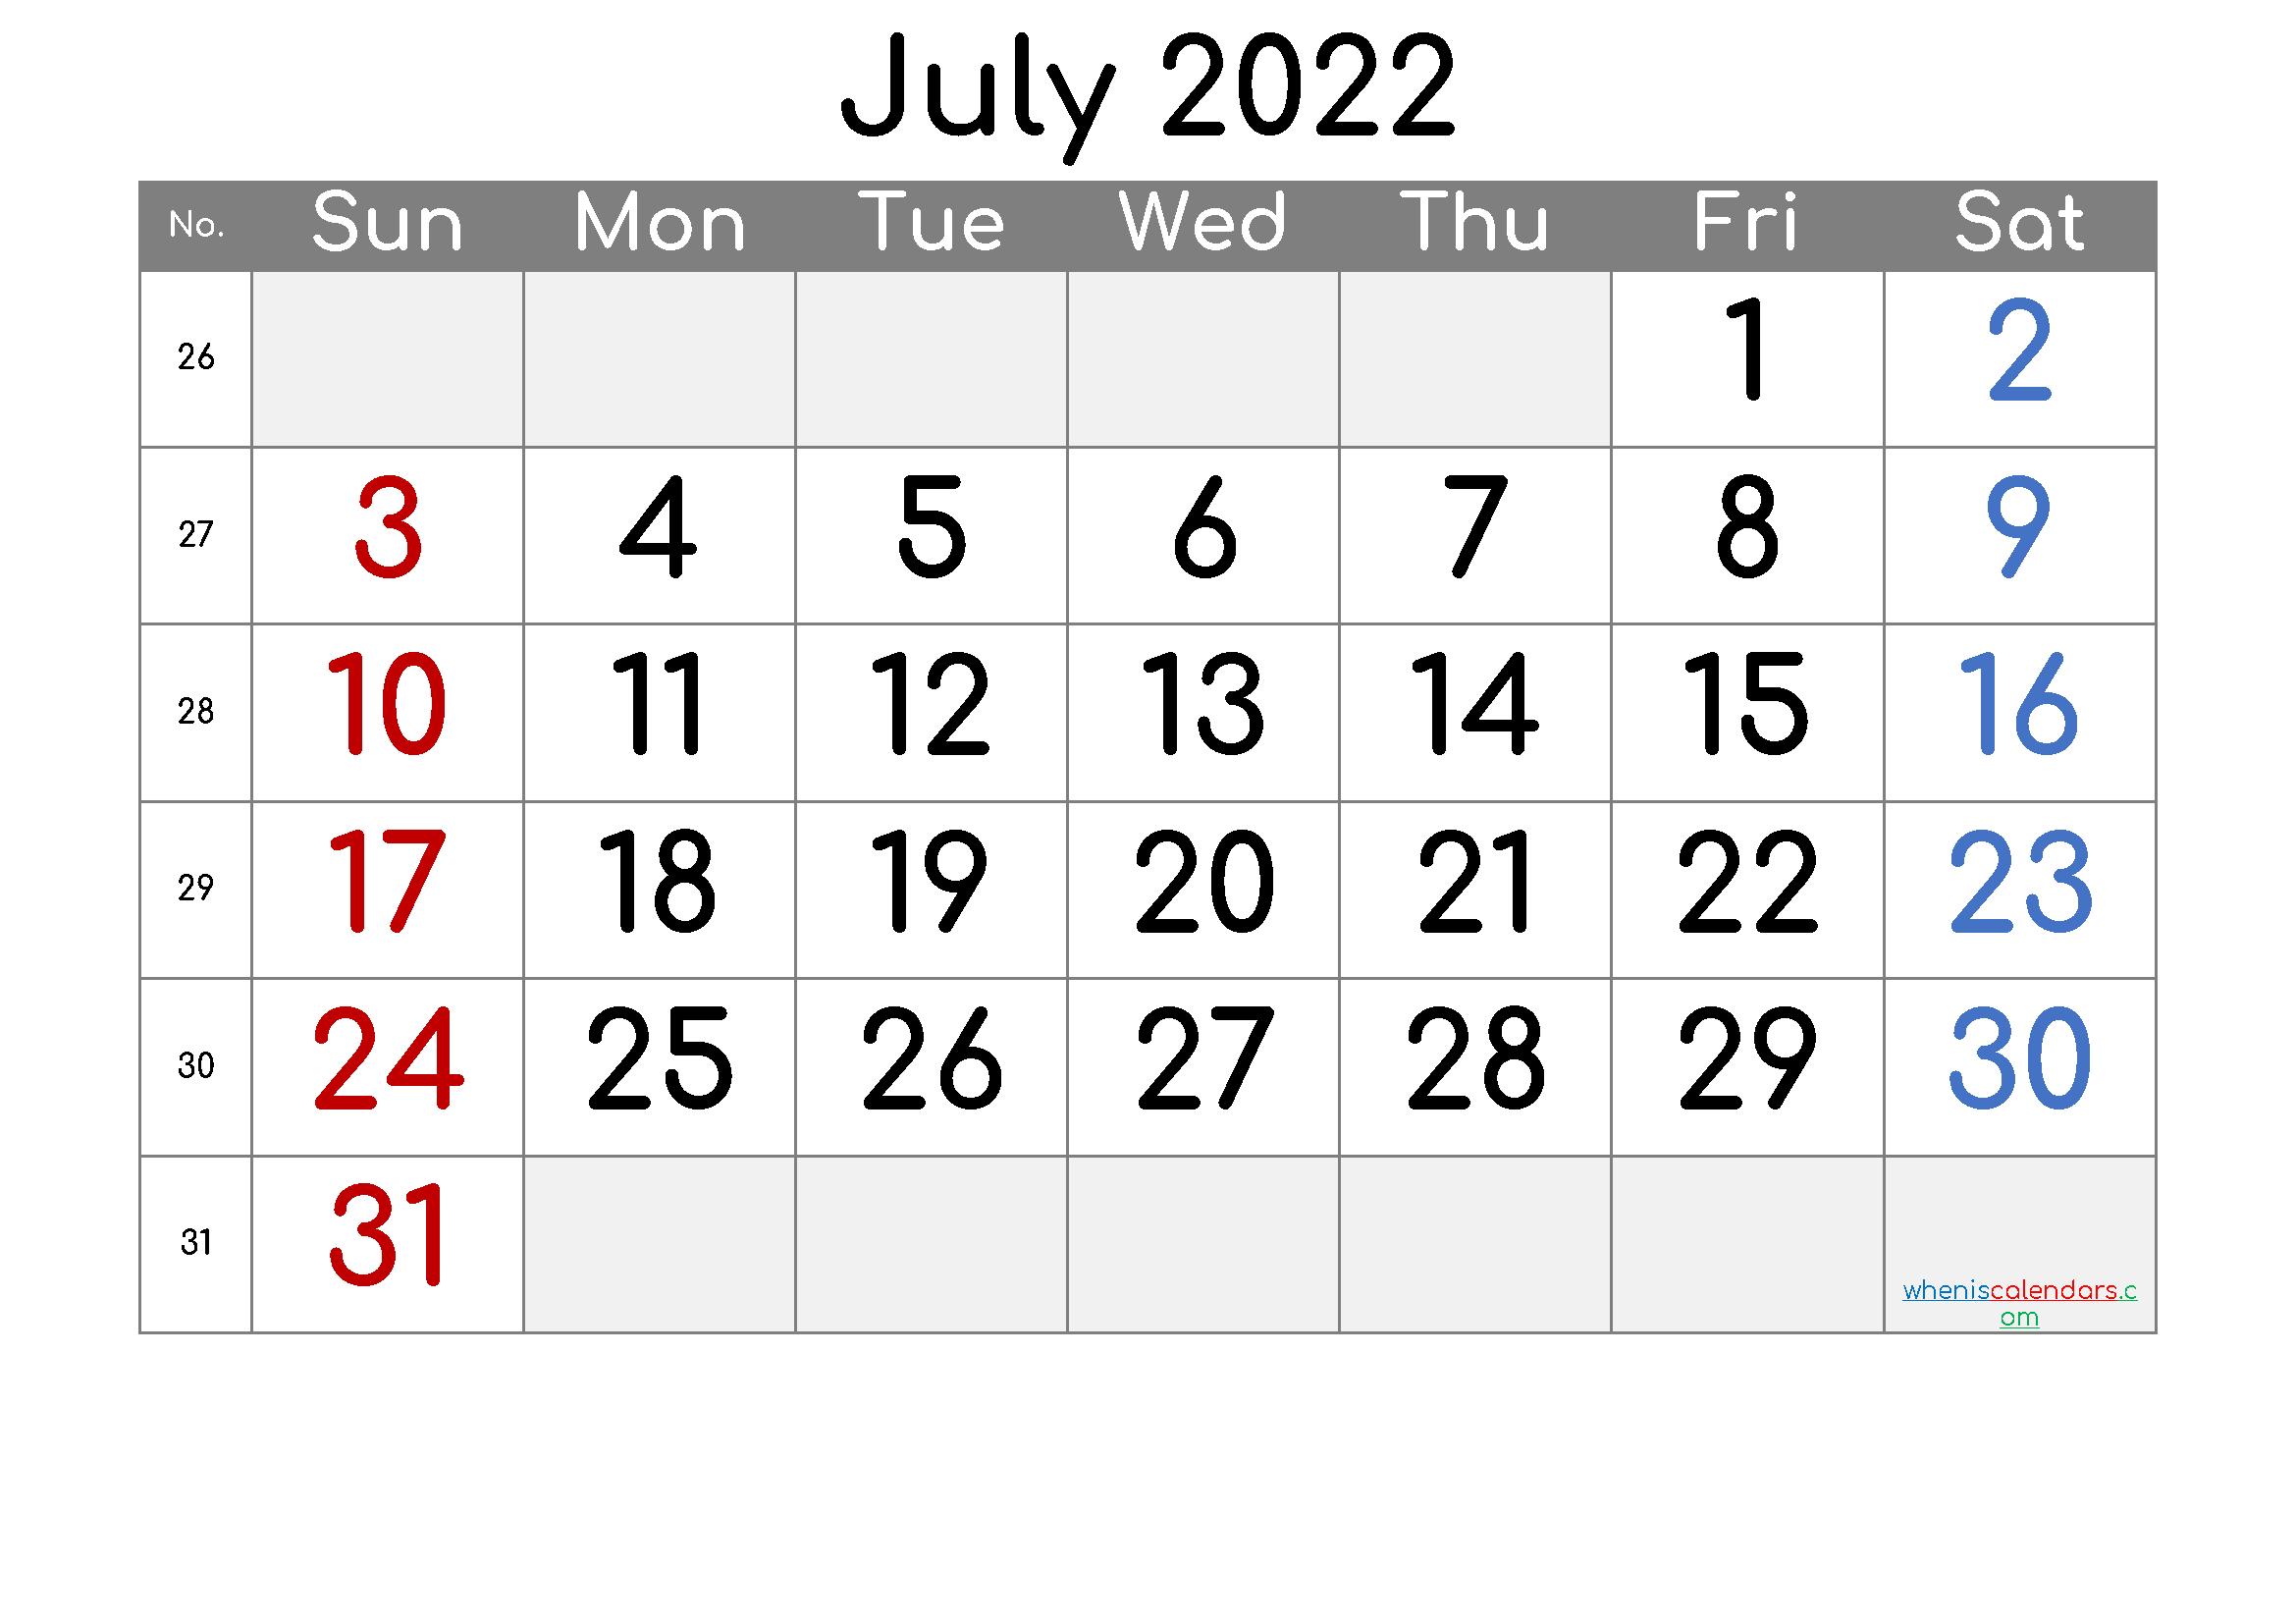 2022 July Free Printable Calendar - 6 Templates - Free with Printable 2022 July Calendar Image